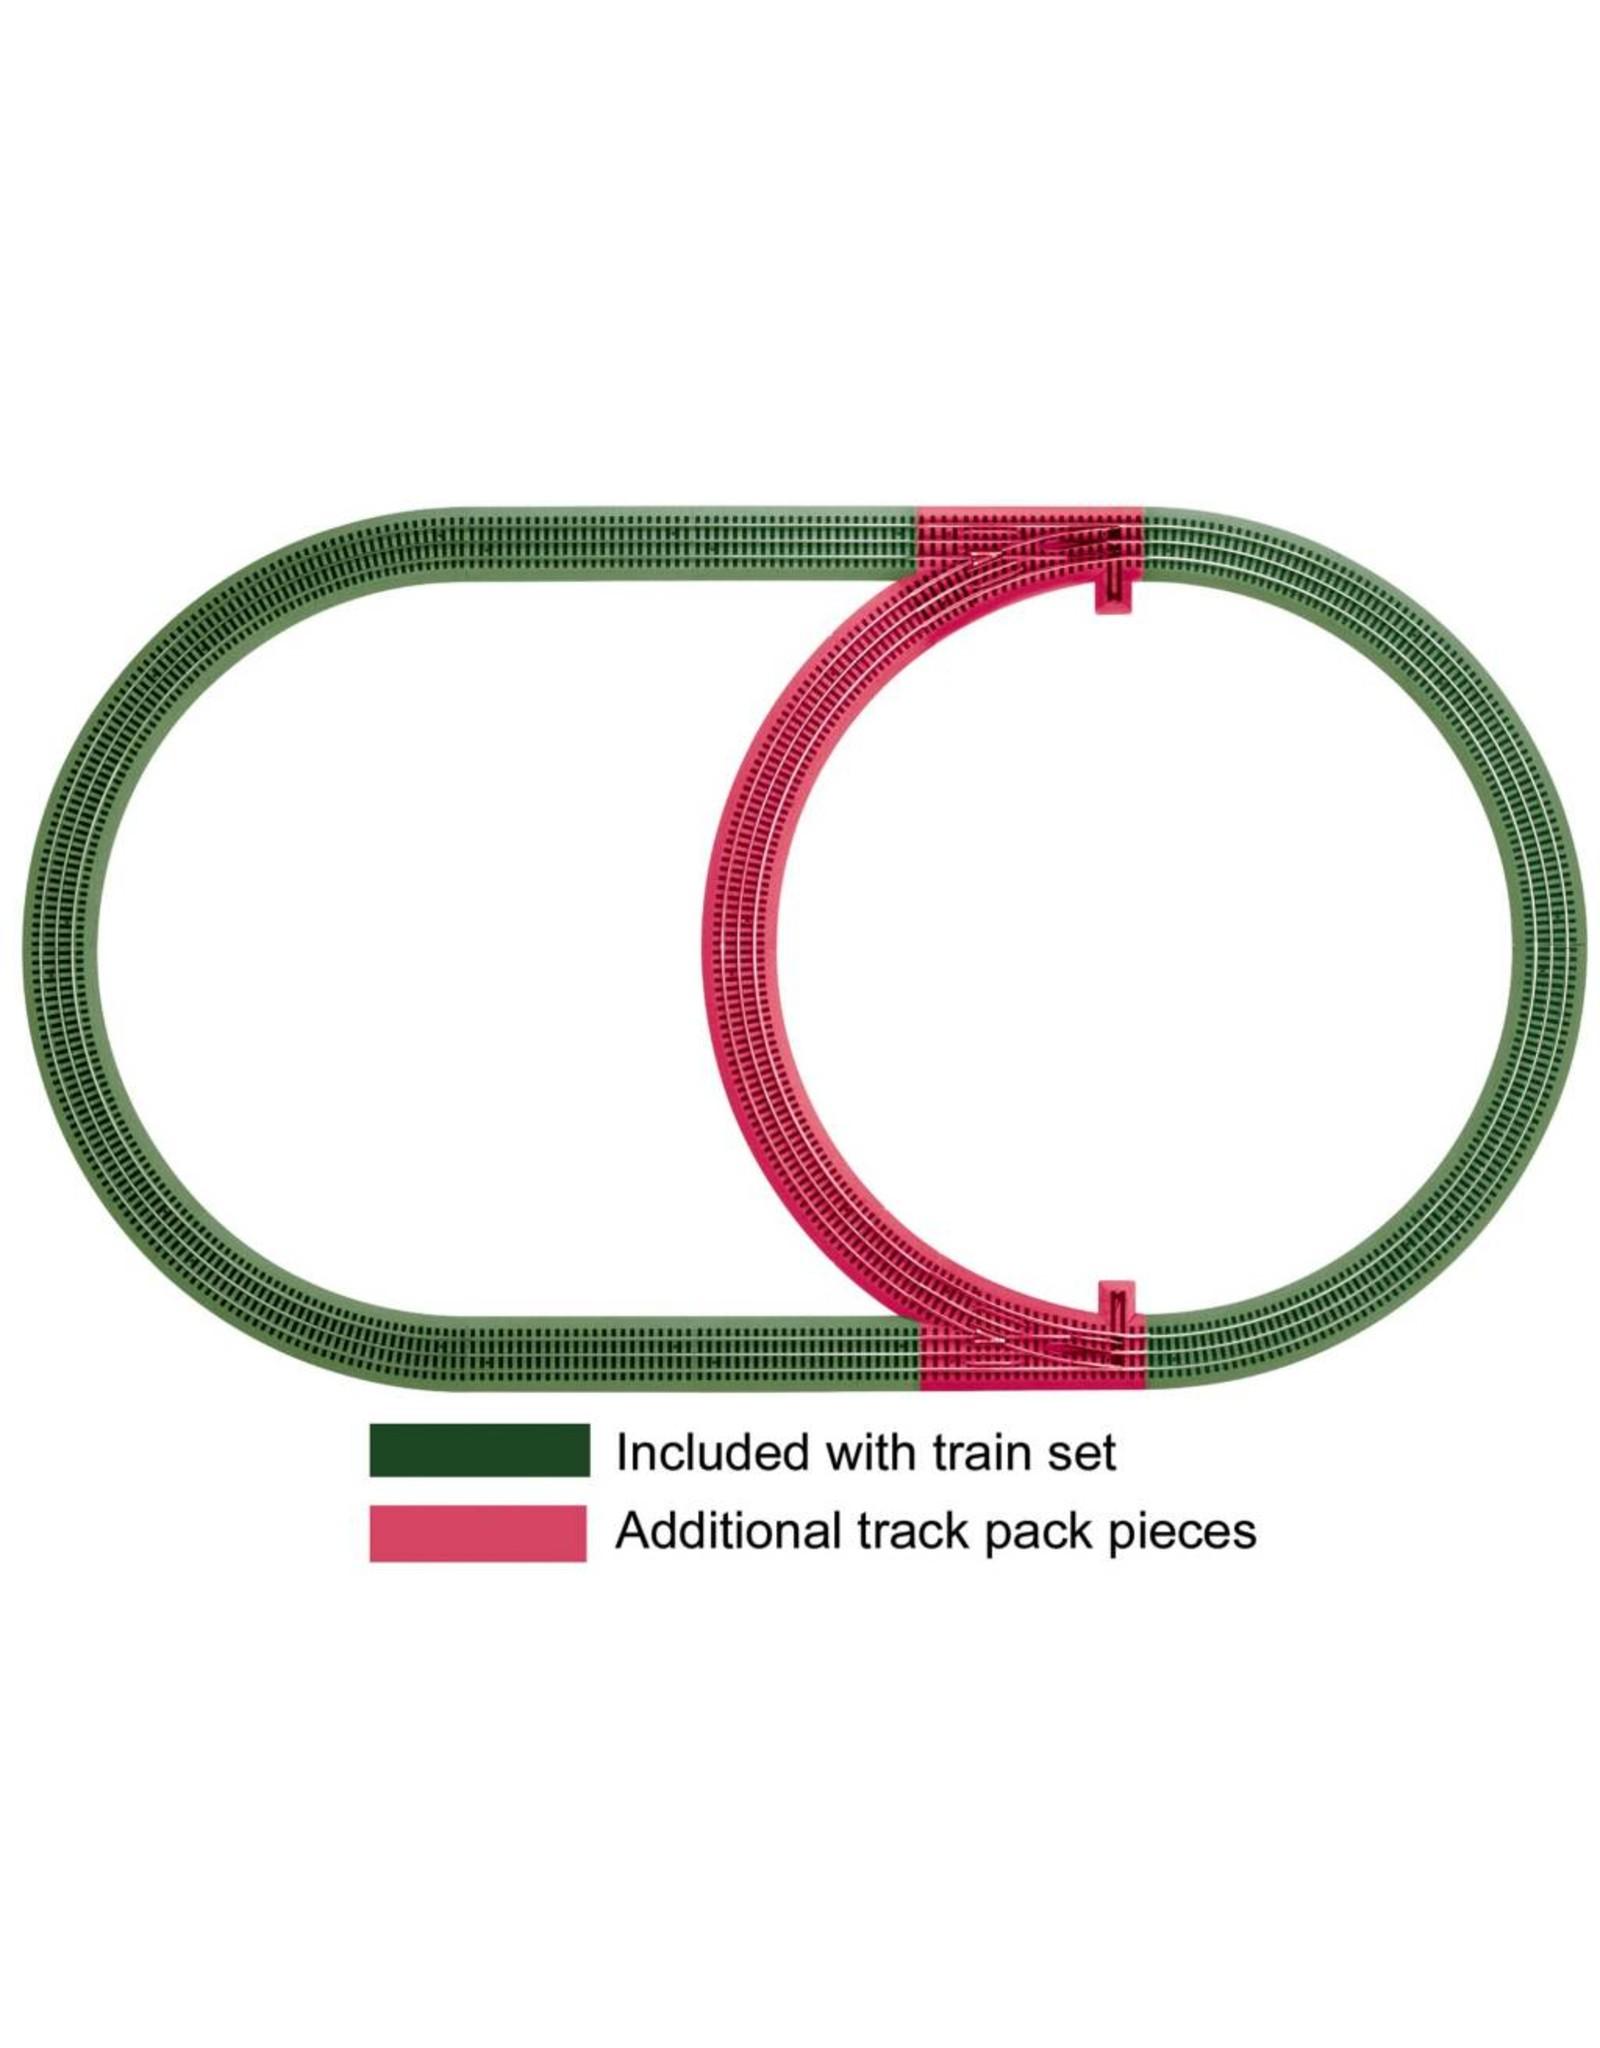 Lionel FasTrack Inner Passing Loop Track Pack - 3-Rail